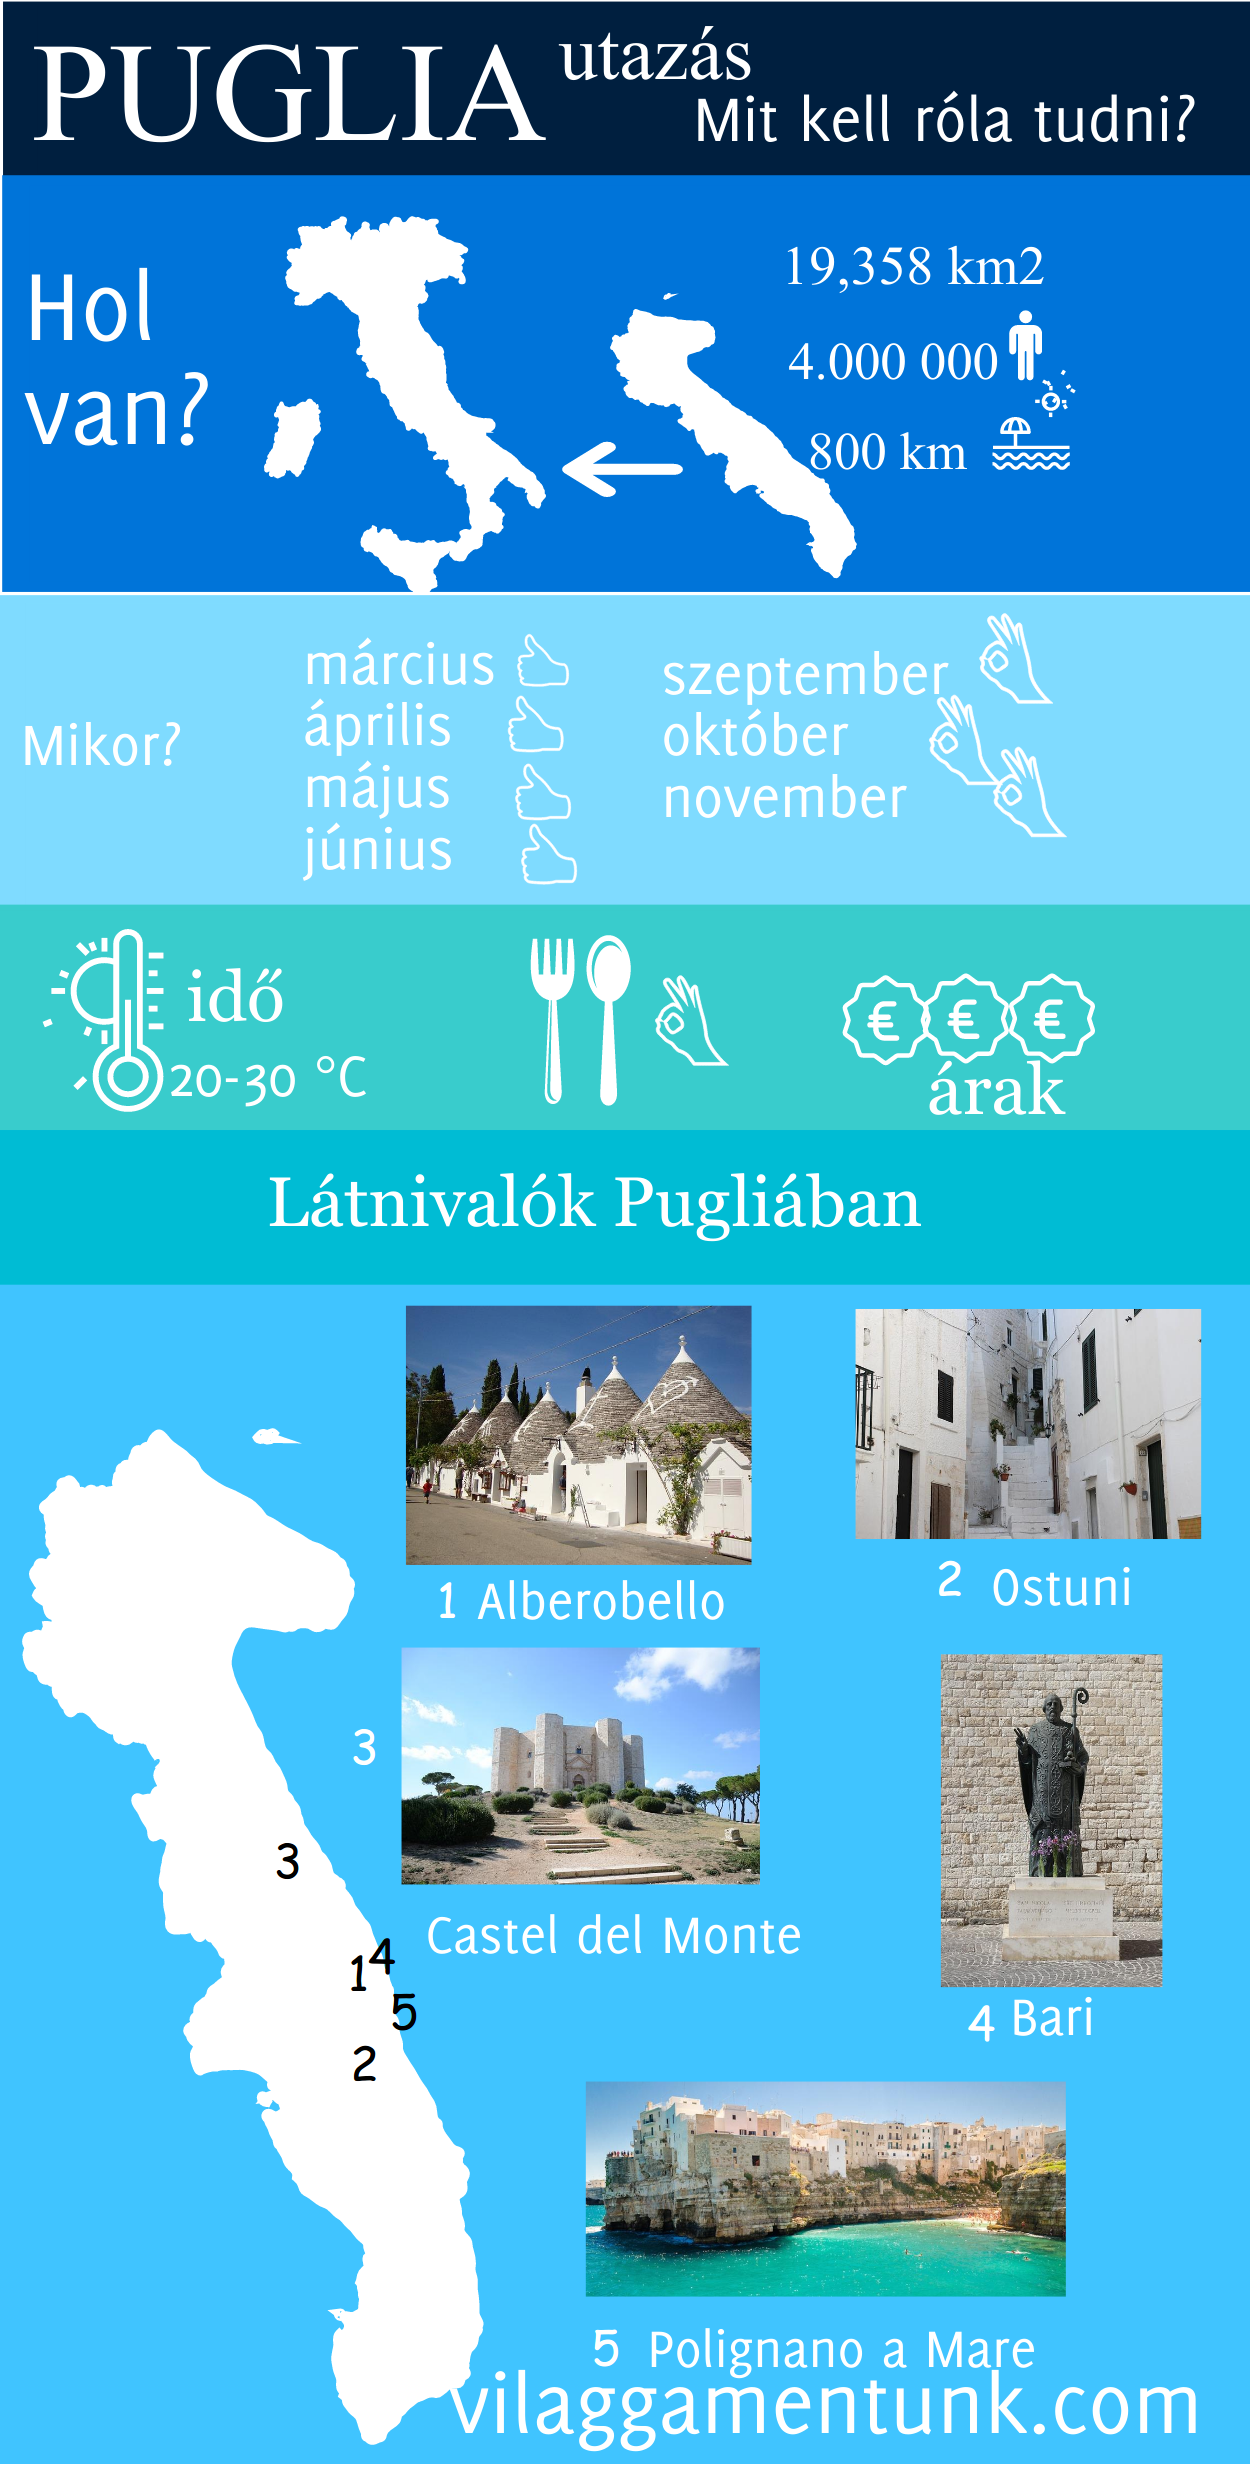 Puglia látnivalói - infografika